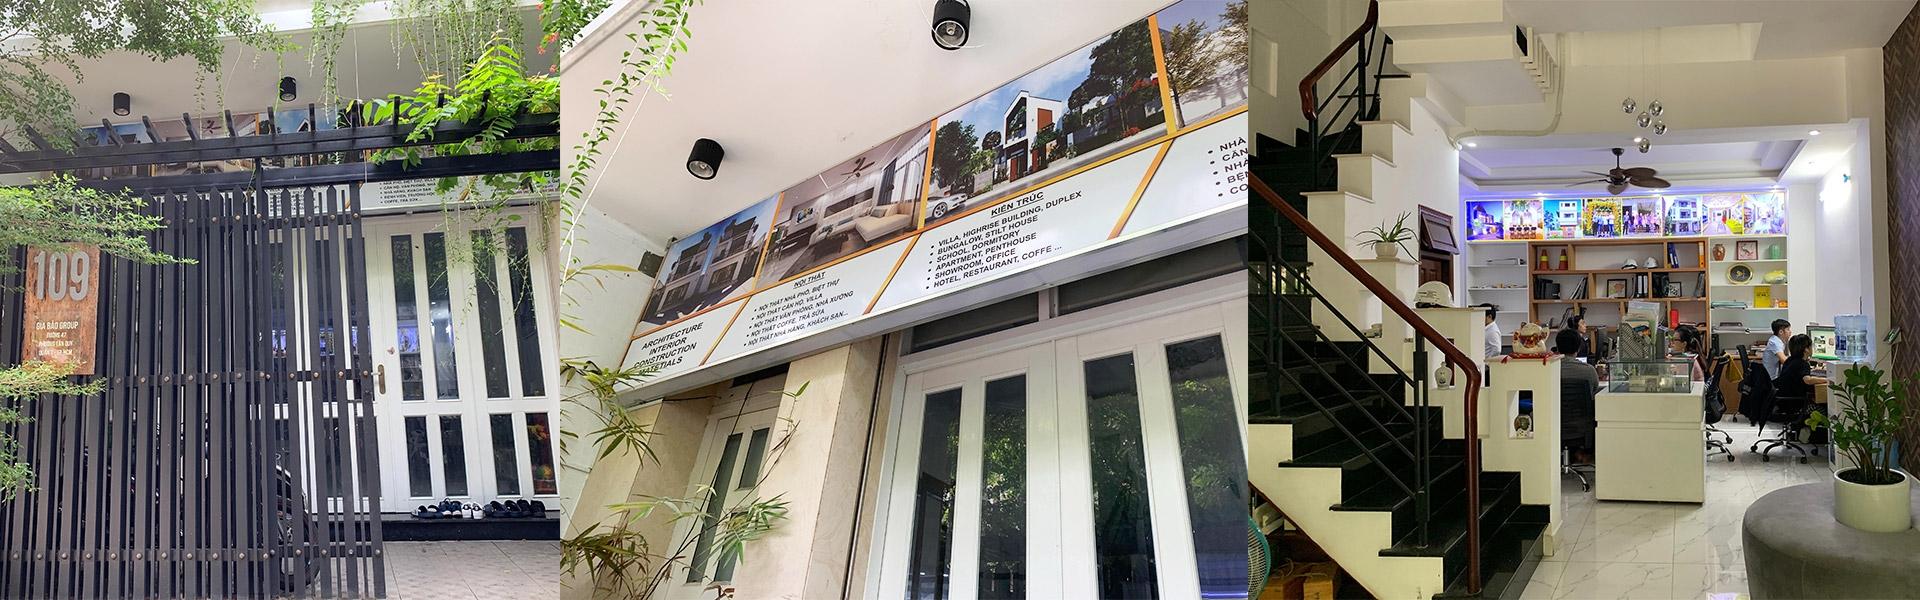 giabaogroup (@giabaogroup) Cover Image